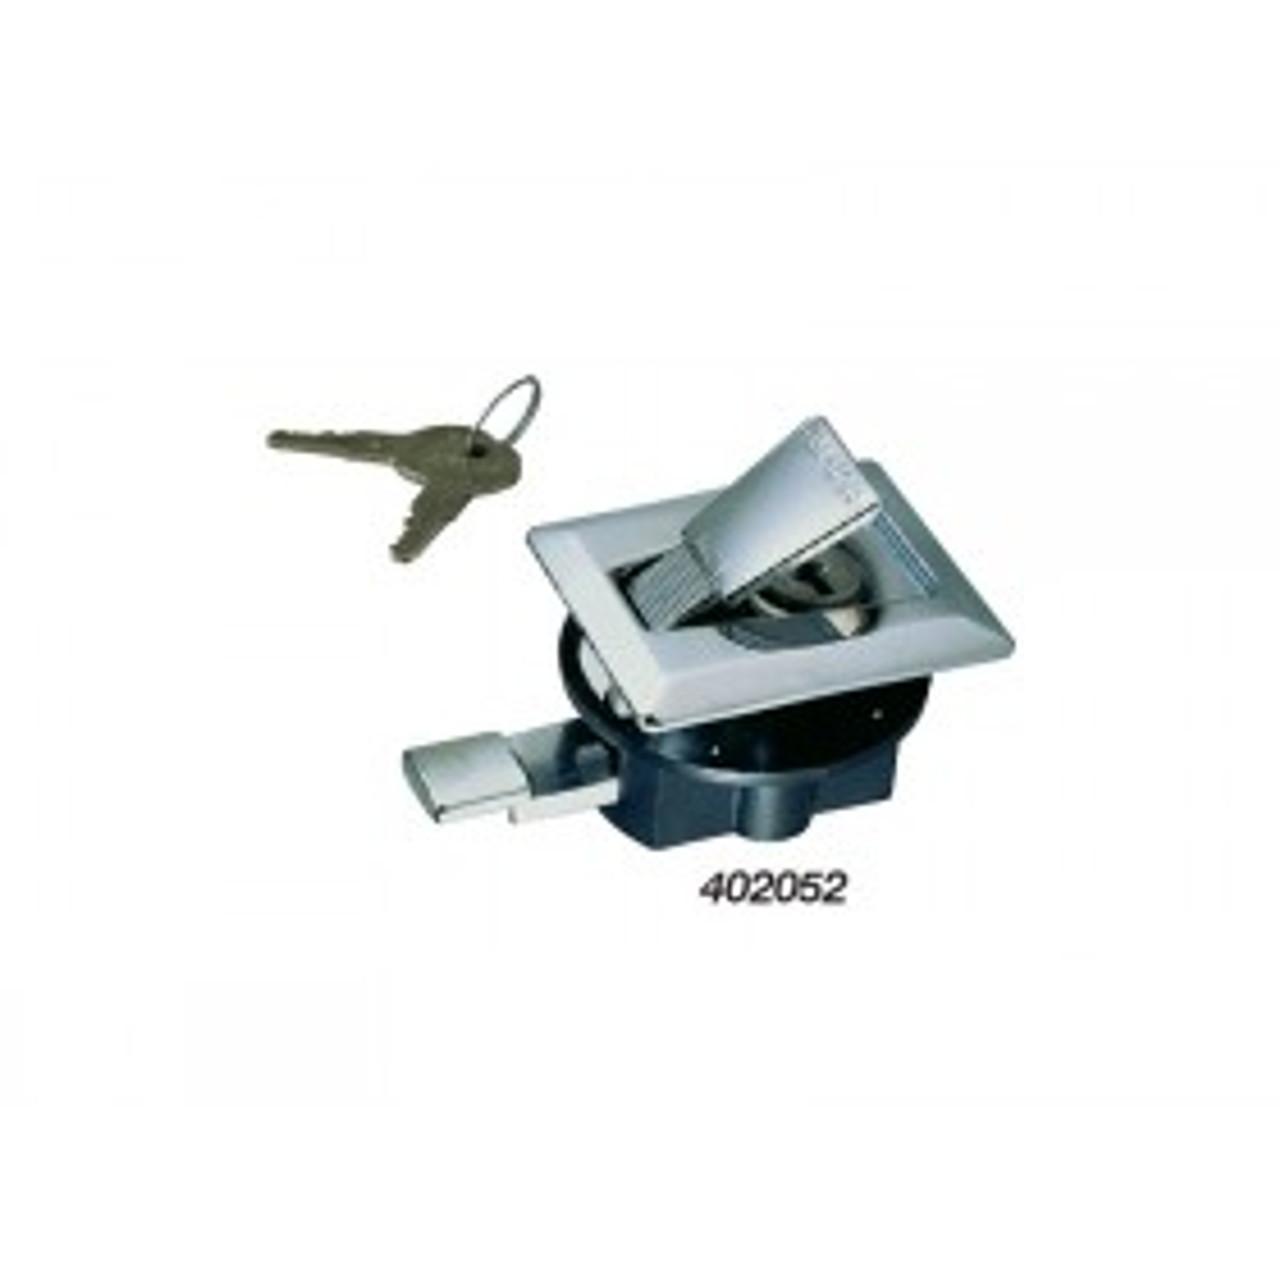 Perko Flush Latch - Chrome Plated Zinc